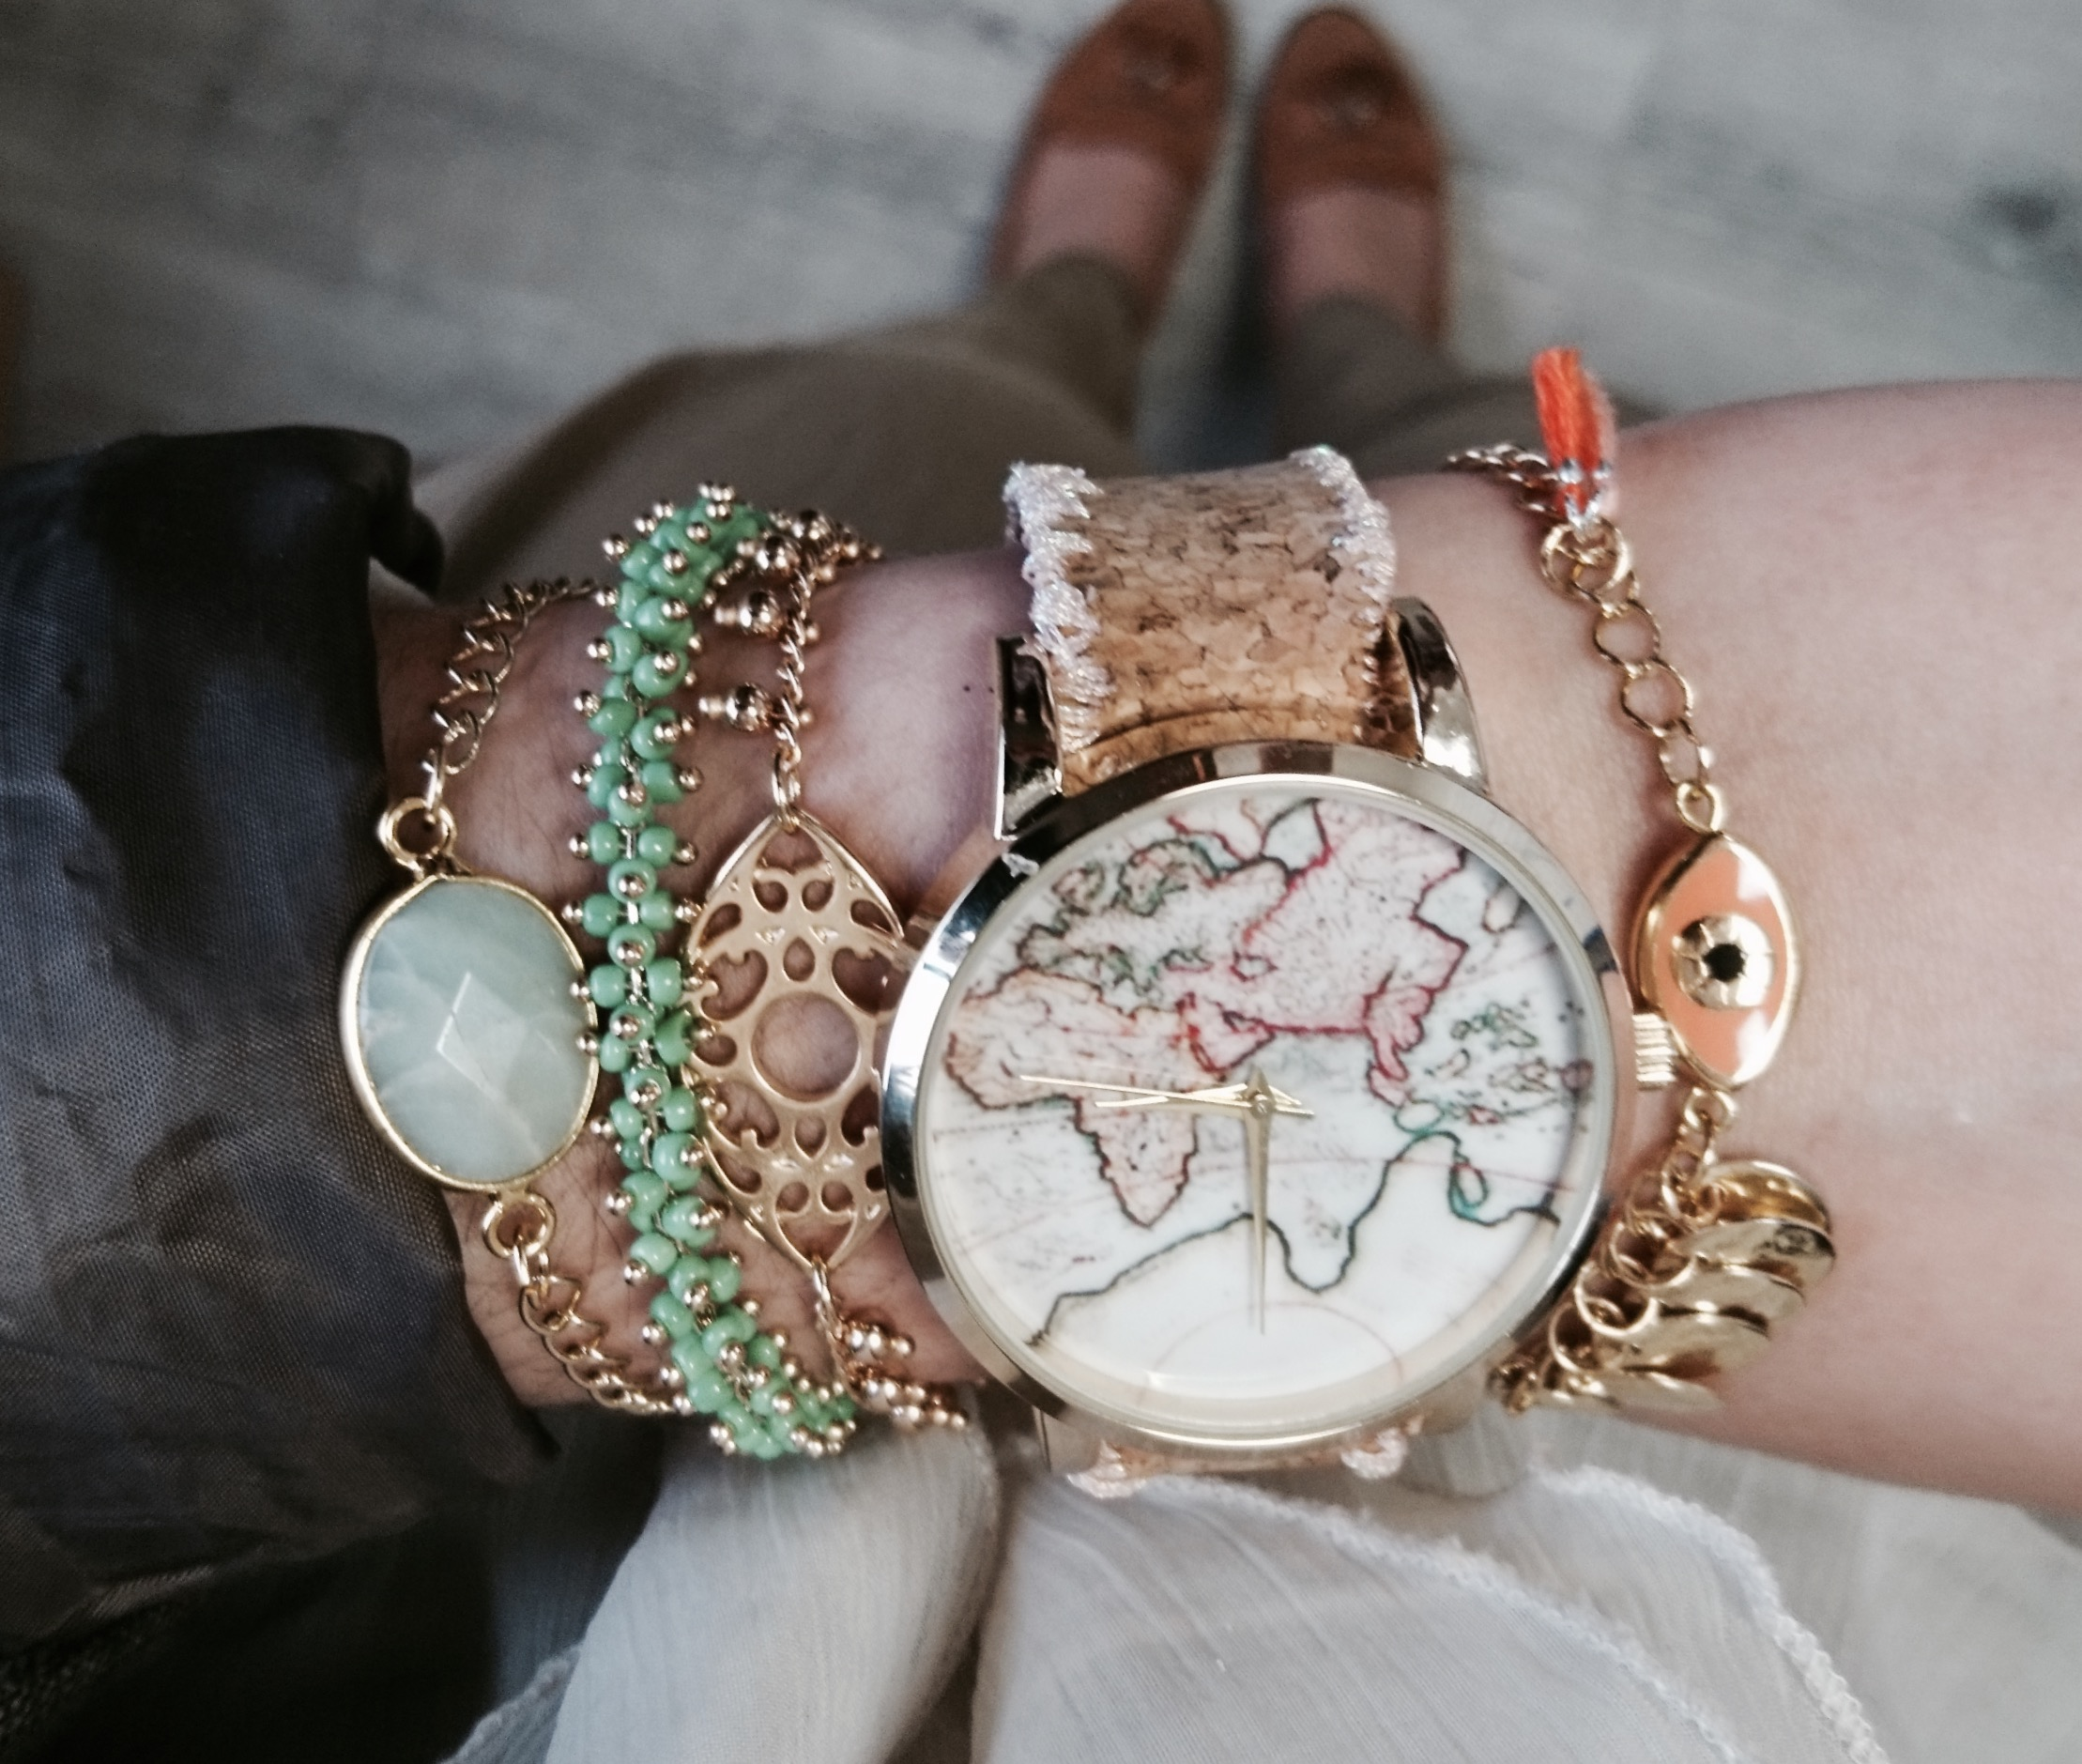 Diy watch world map embroidered cork bracelet perles co dmc thread embroidery on diy watch bracelet in cork diy liege tour around the world gumiabroncs Gallery